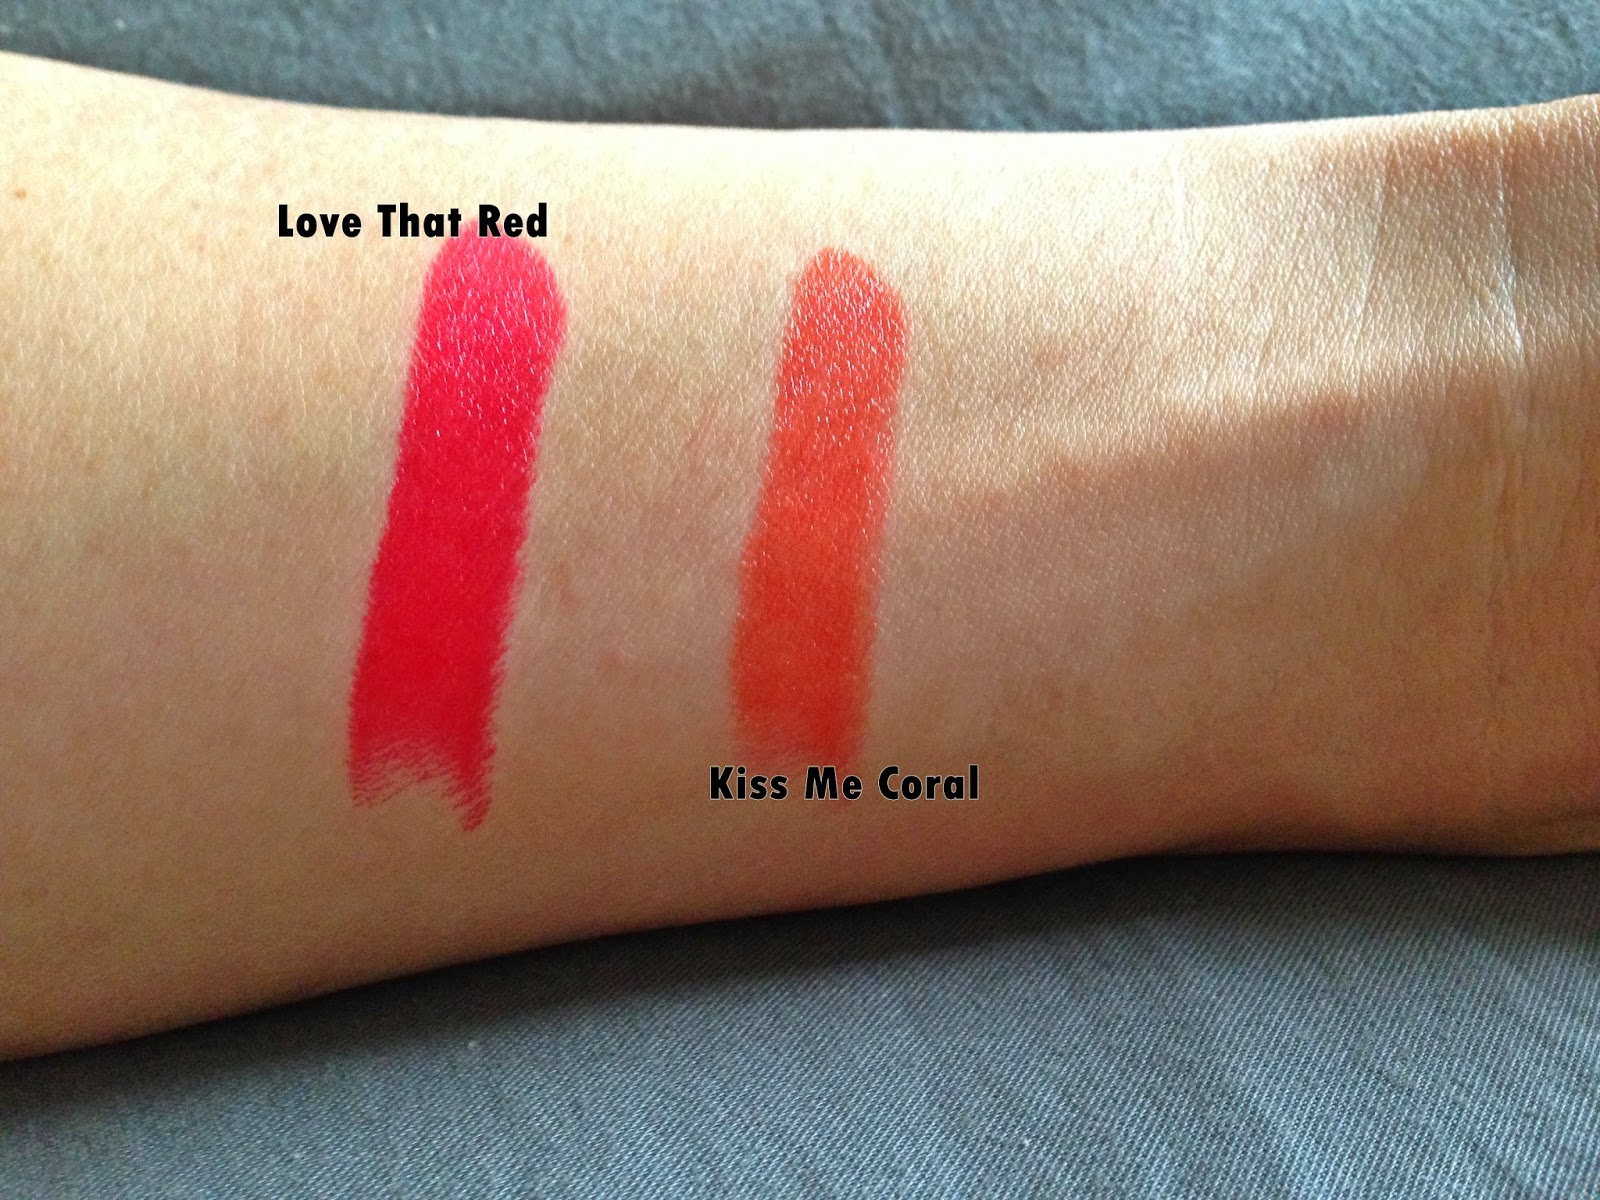 Revlon Love That Red